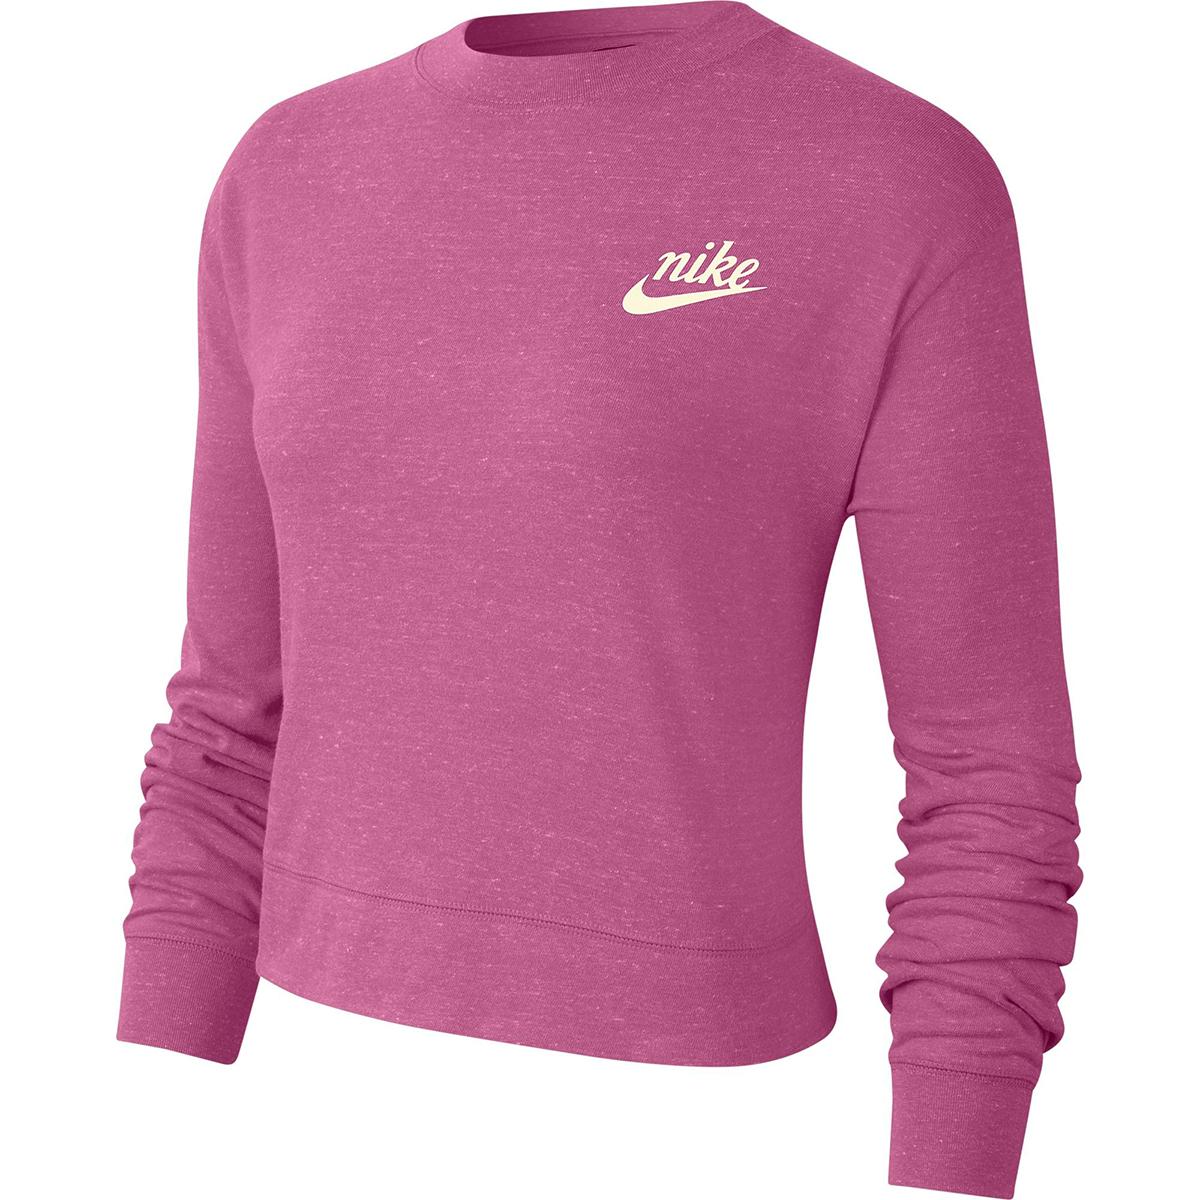 Nike Women's Sportswear Gym Cropped Crew Top - Red, L